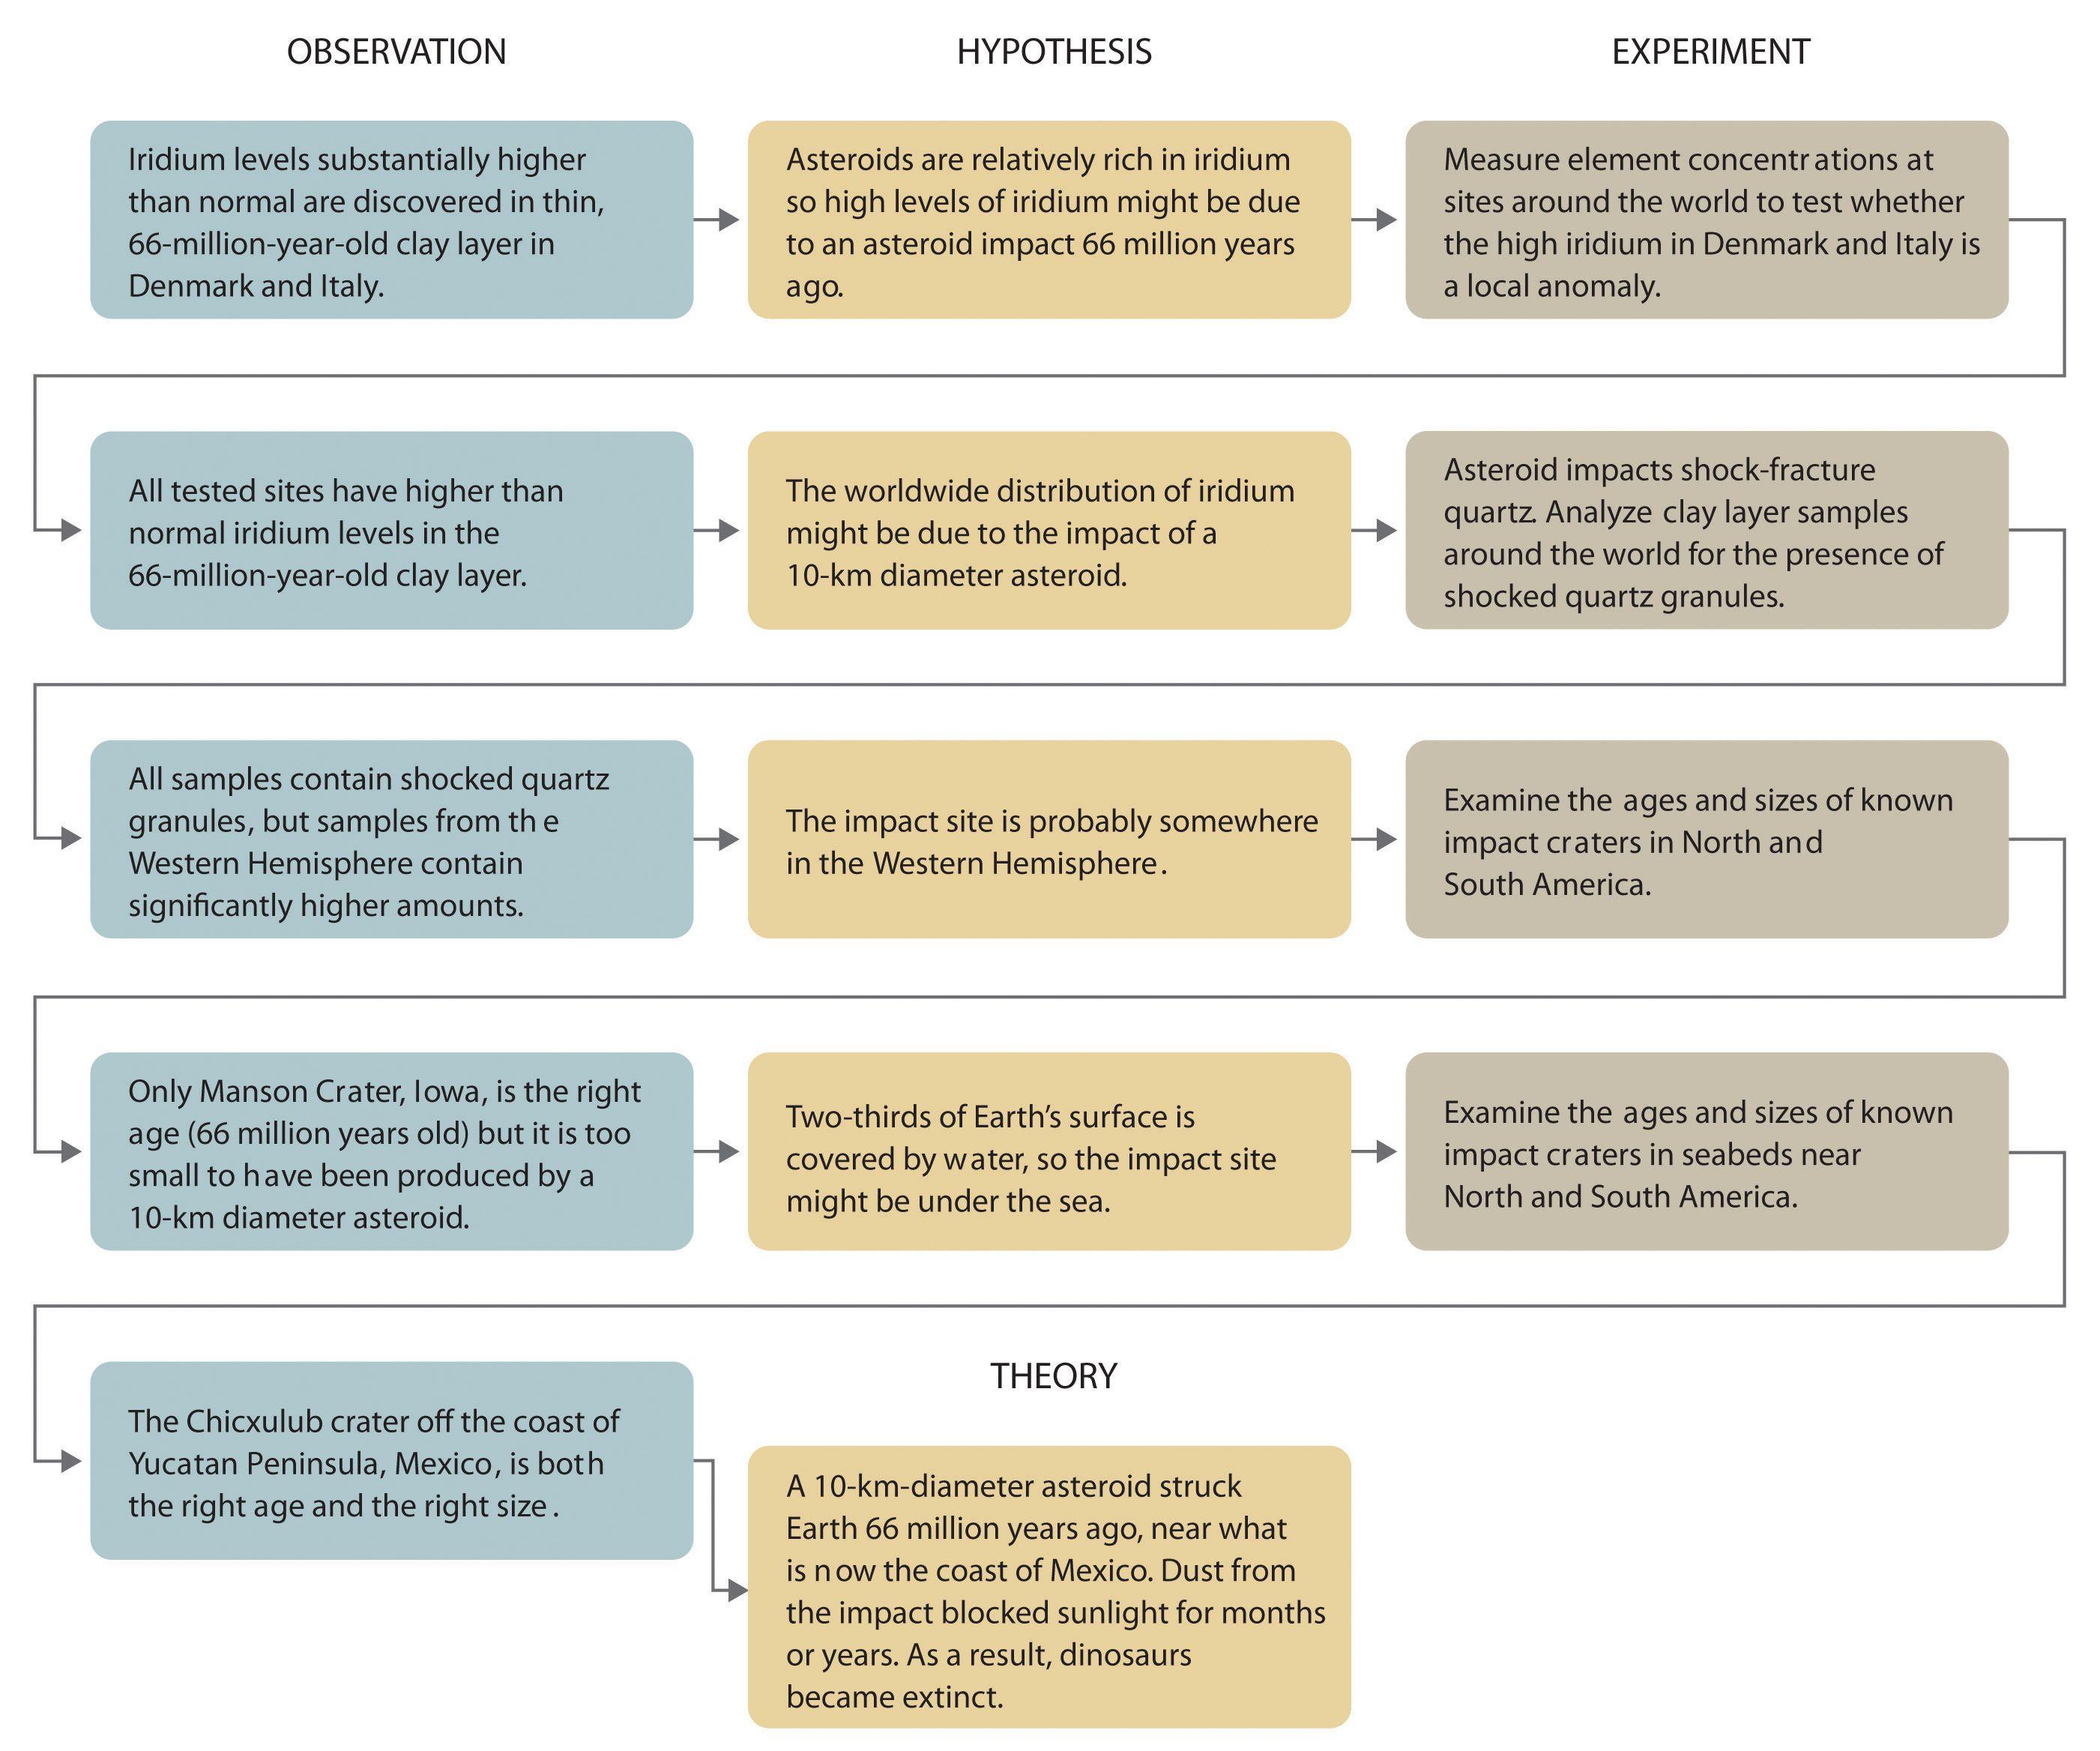 Worksheet Scientific Method Steps Worksheet Grass Fedjp